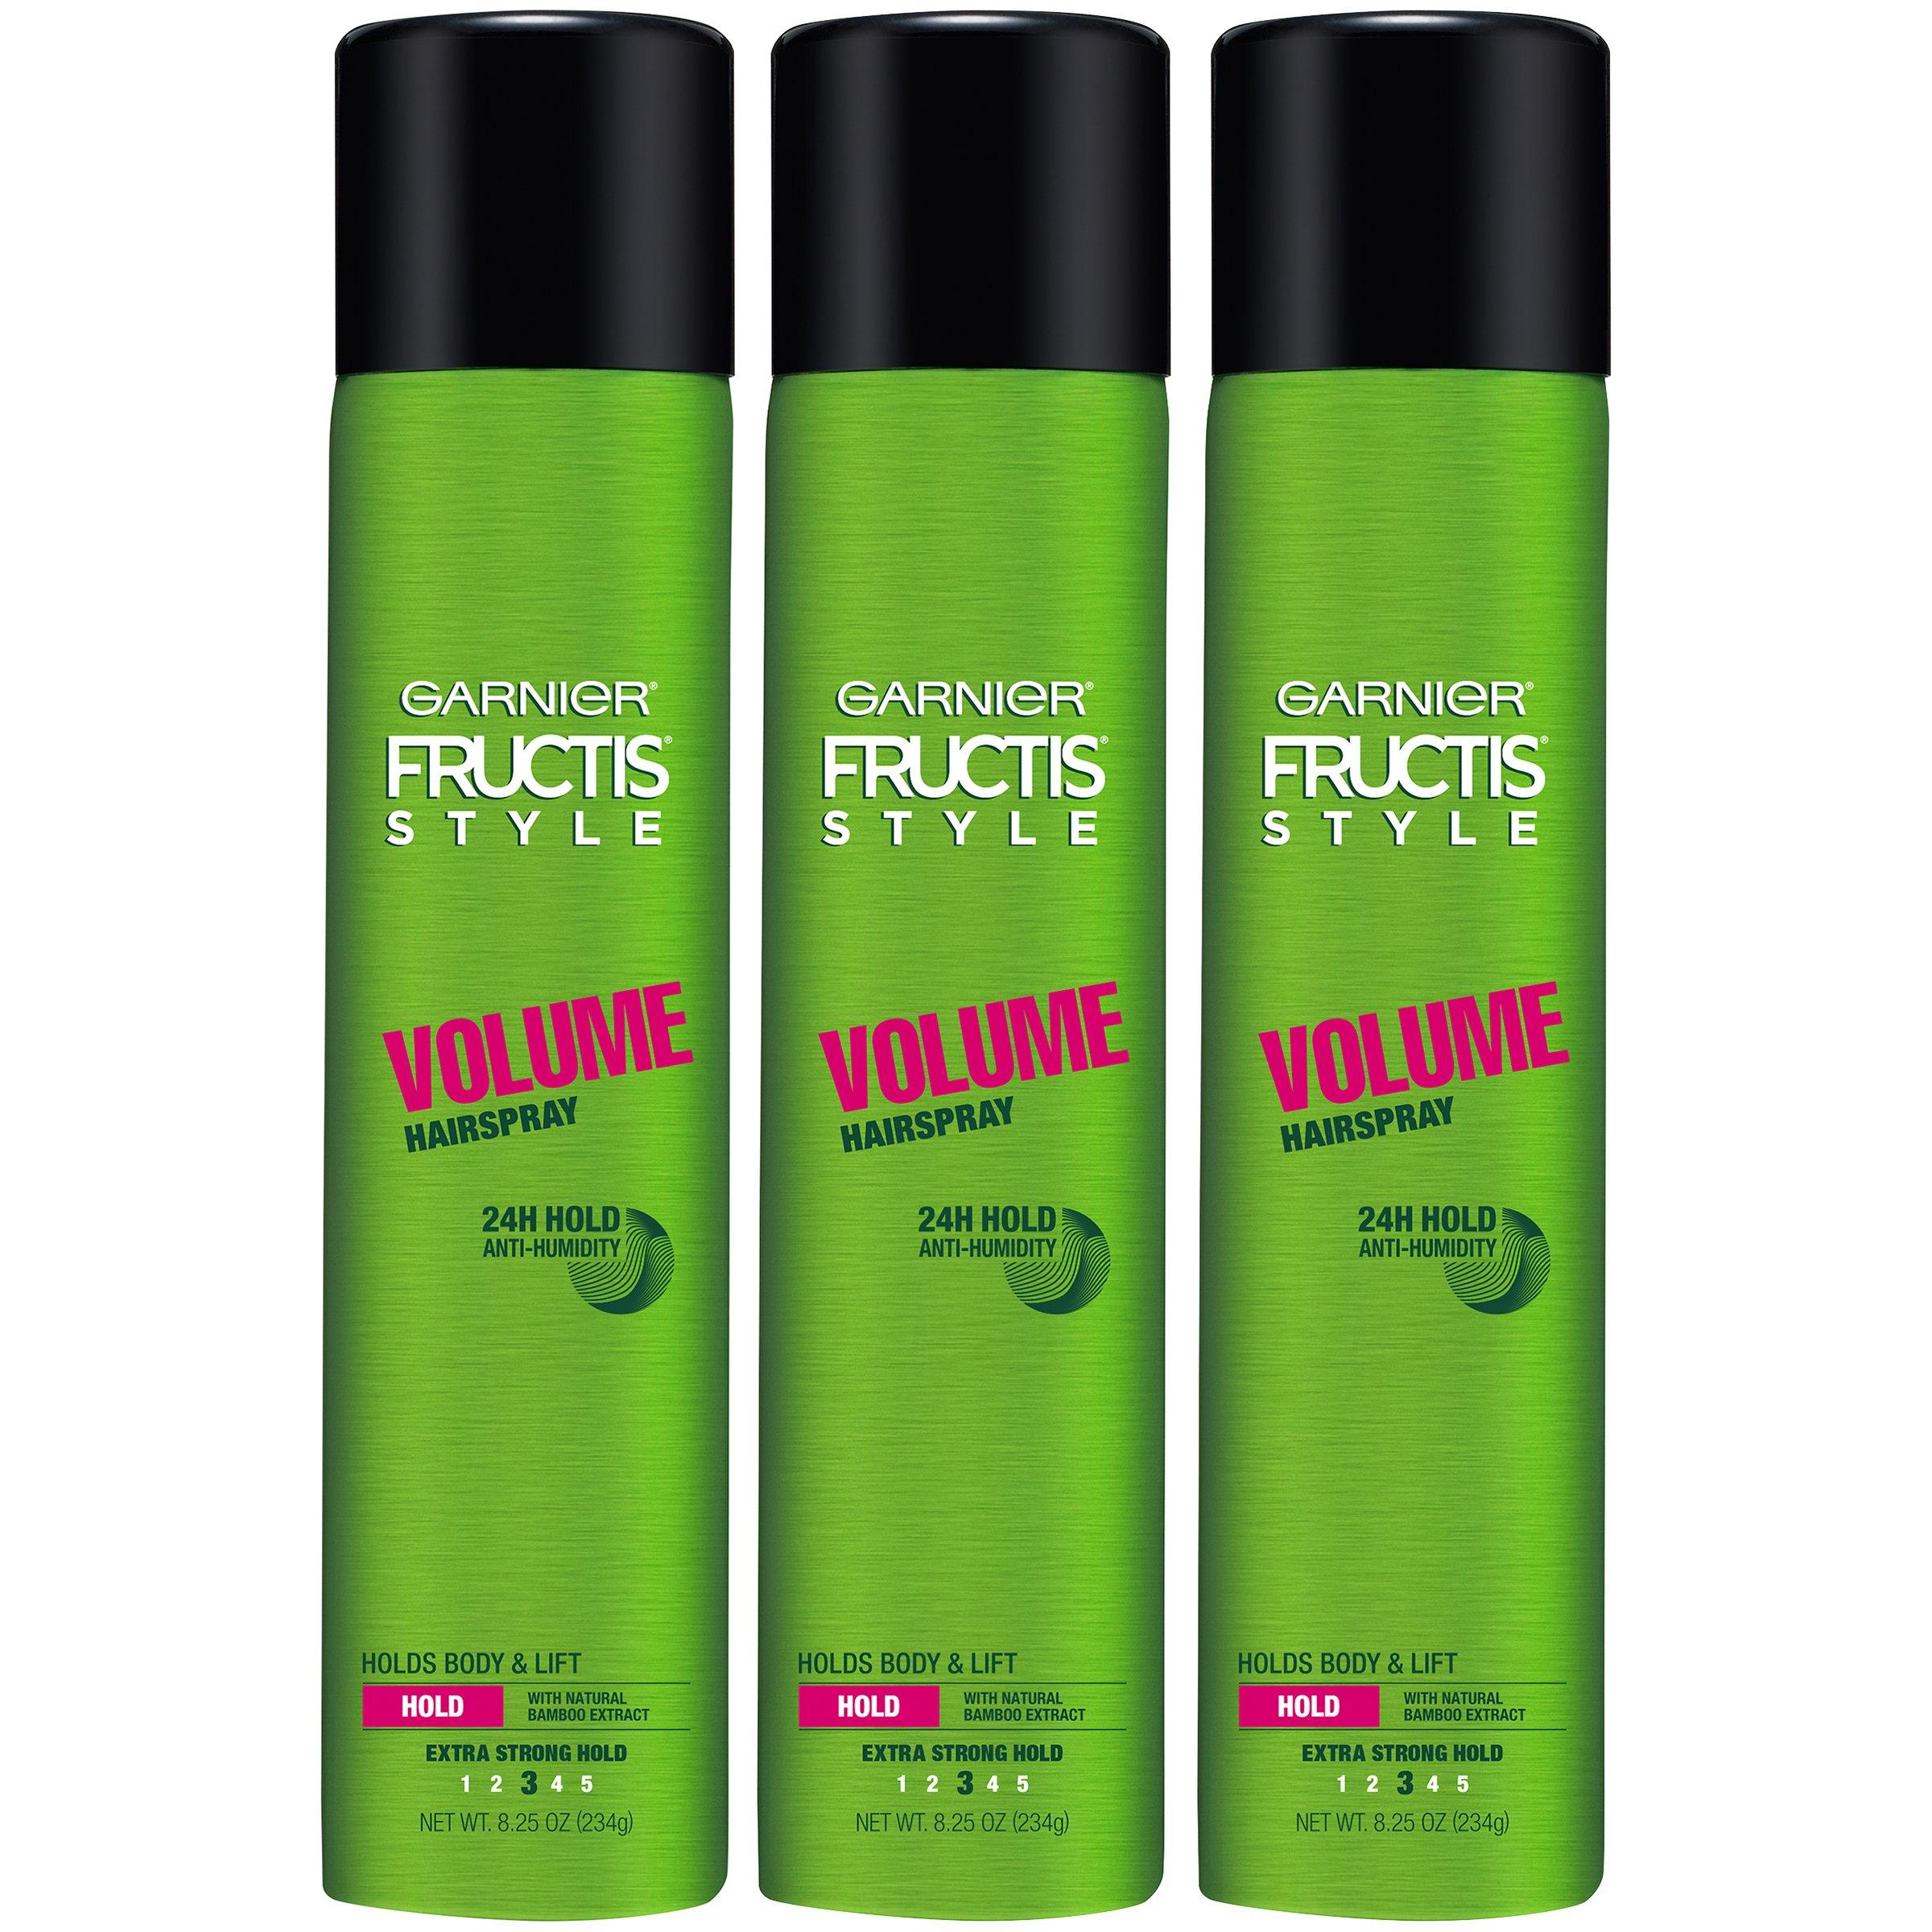 Garnier Fructis Style Volume Hairspray, All Hair Types, 8.25 oz. (Packaging May Vary), 3 Count